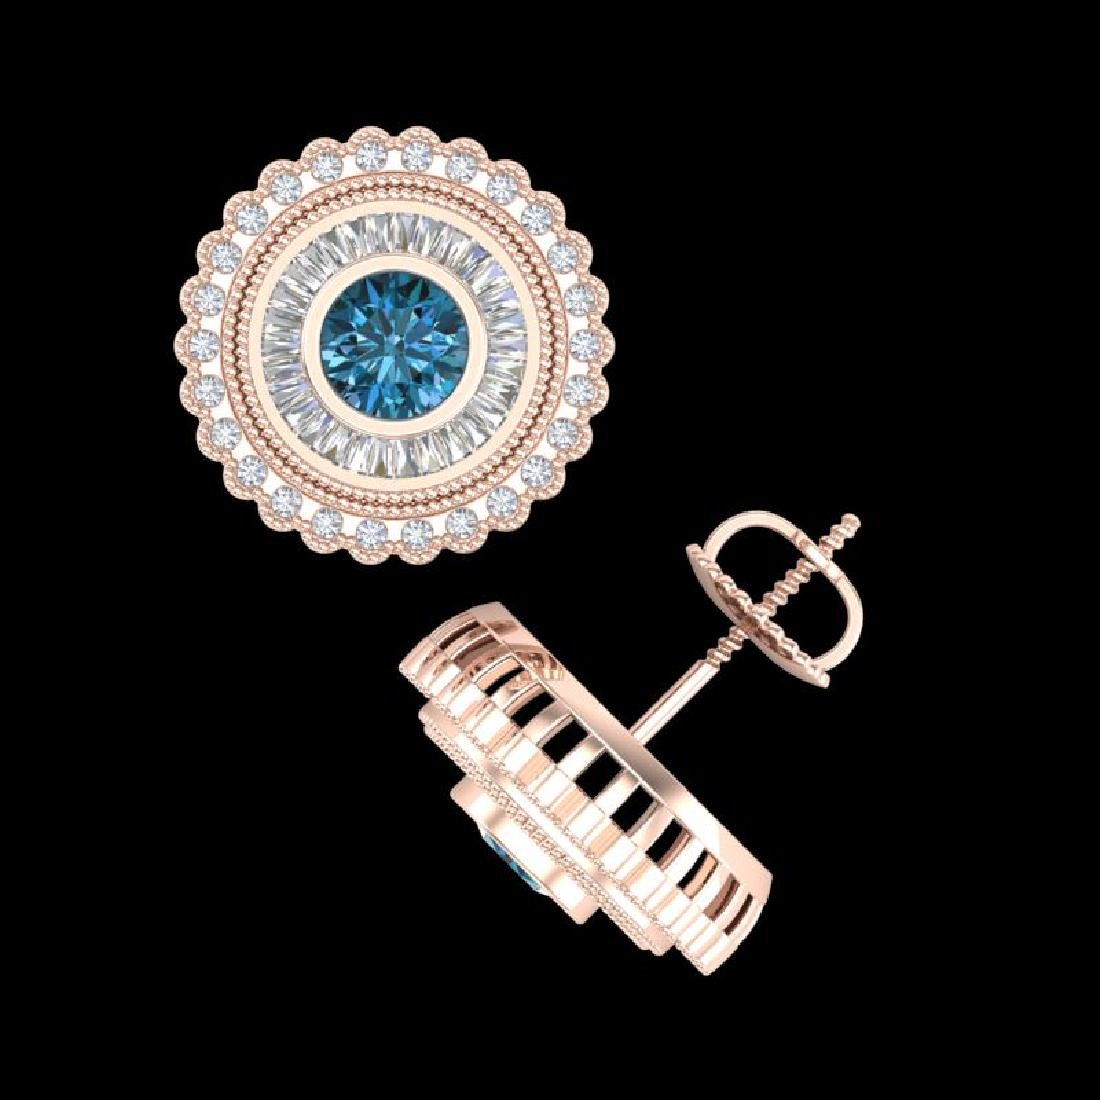 2.61 CTW Fancy Intense Blue Diamond Art Deco Stud - 3